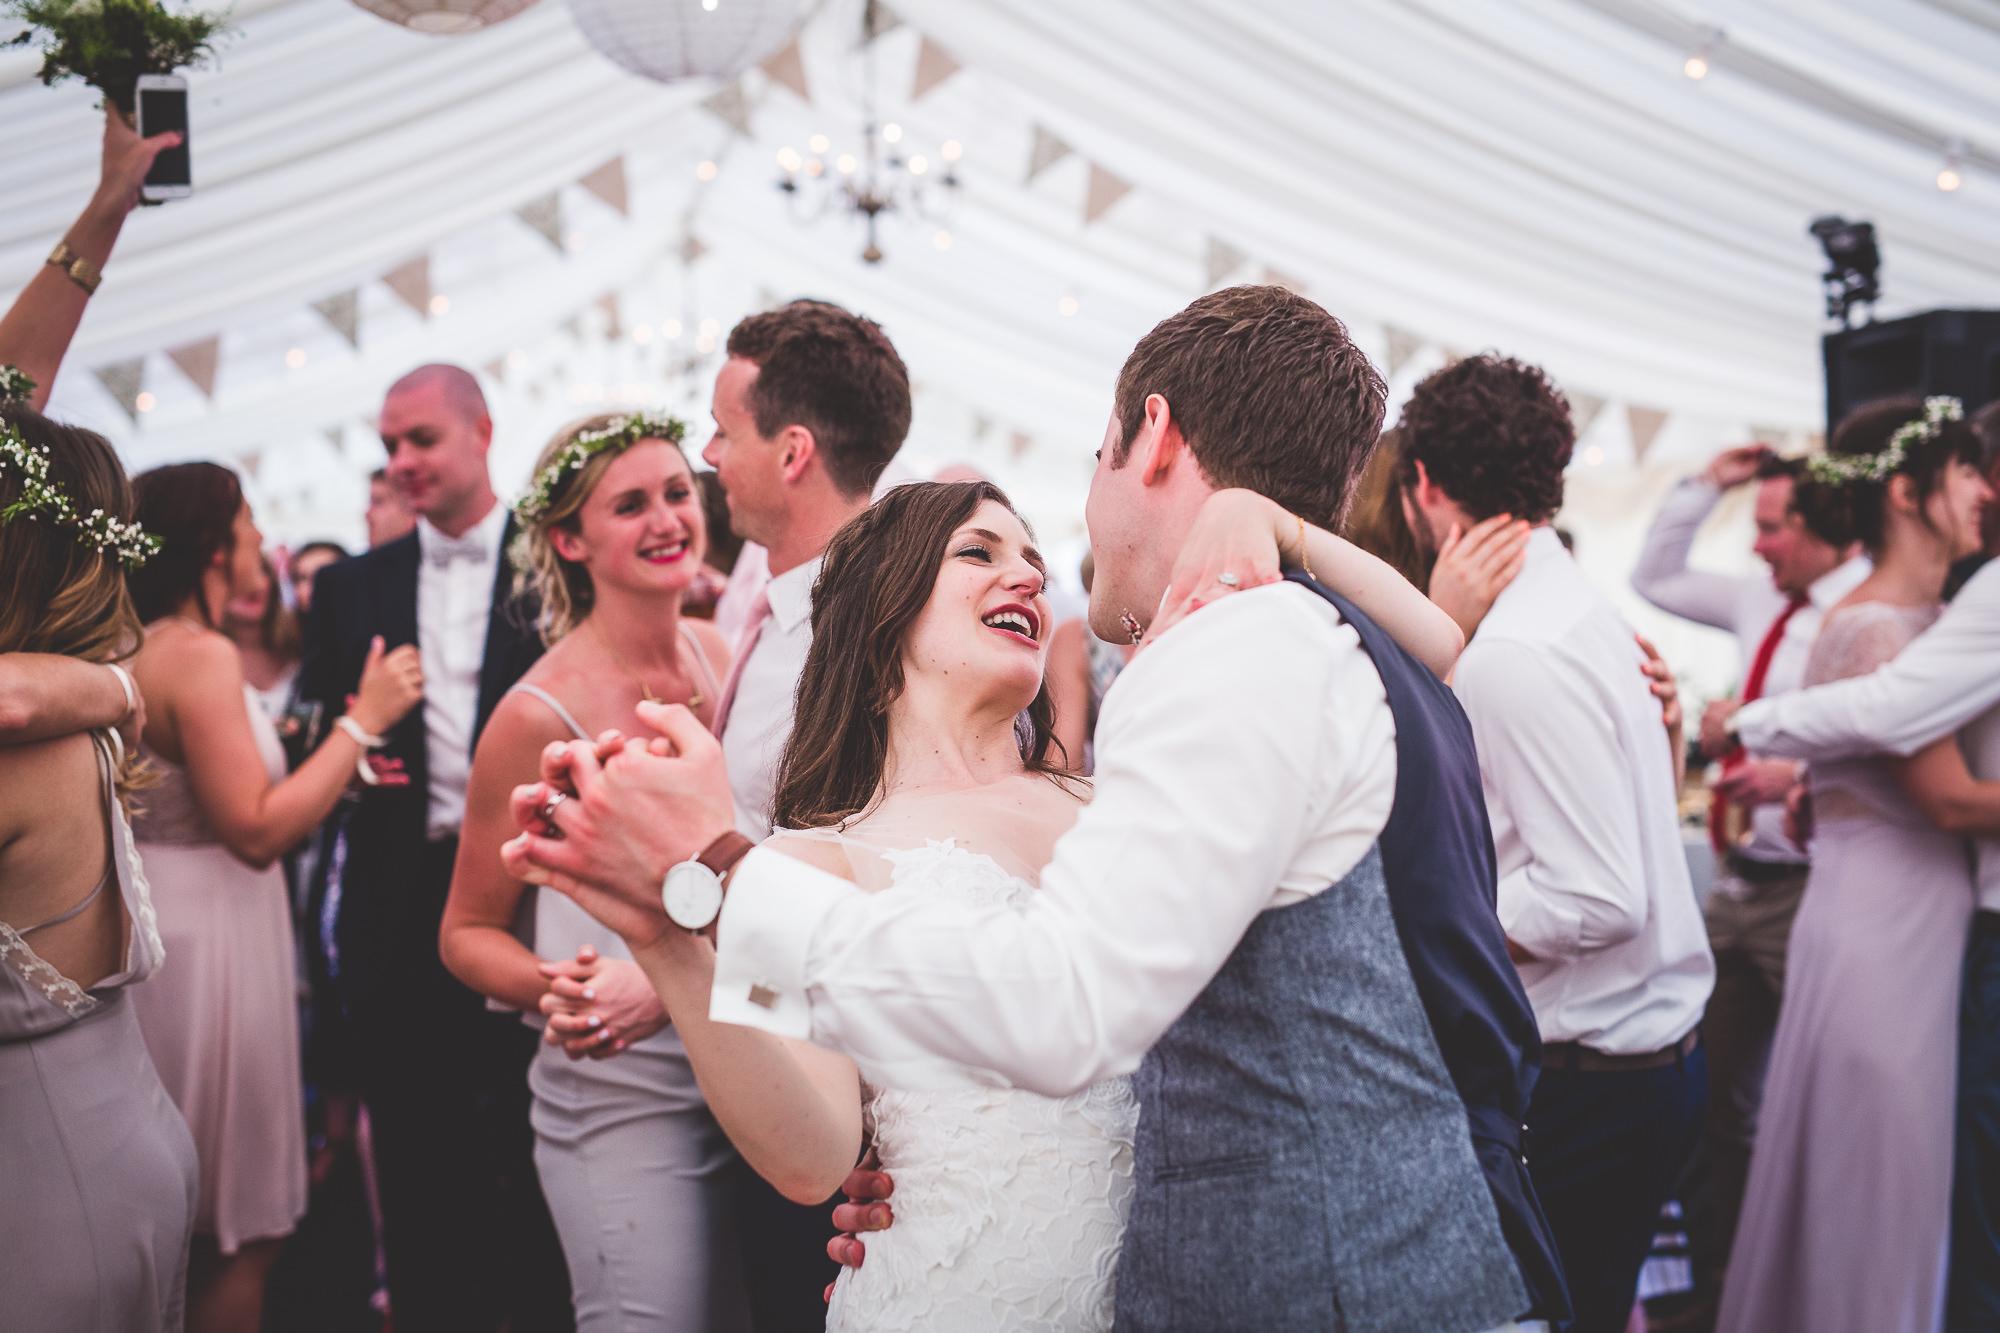 Veils & Bales Wedding Photography | Charlie & Steve SCSS 259